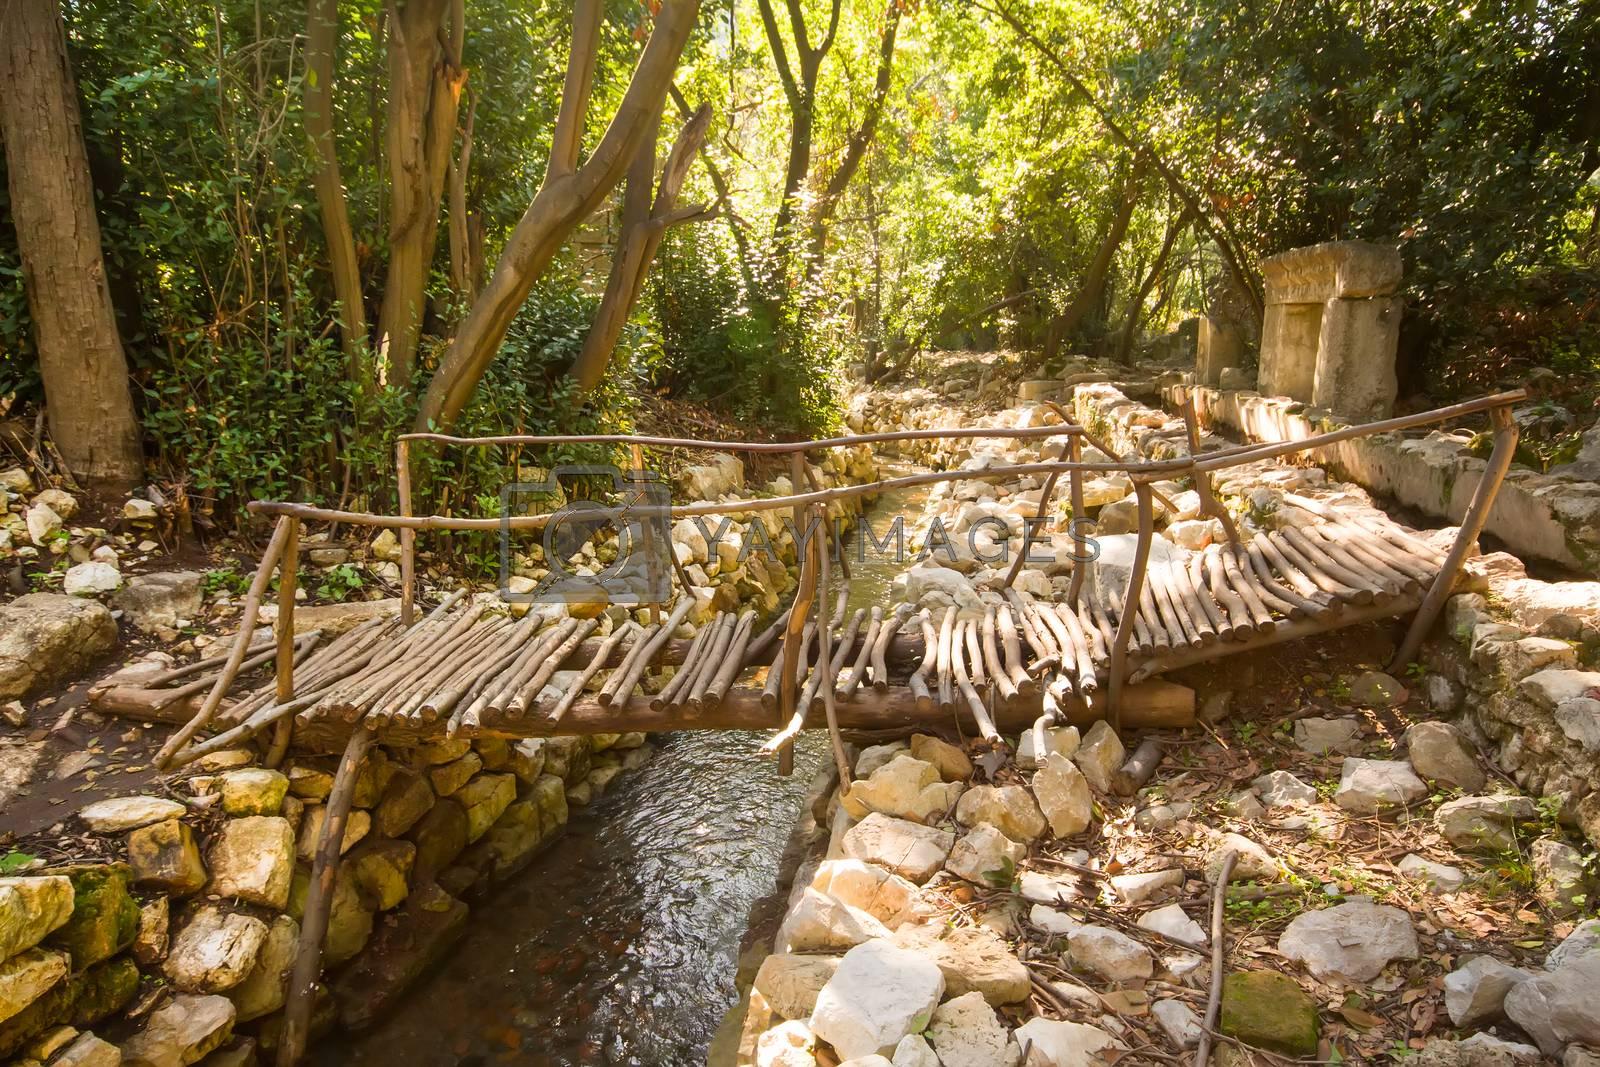 Turkey Olimpos bridge through a stream